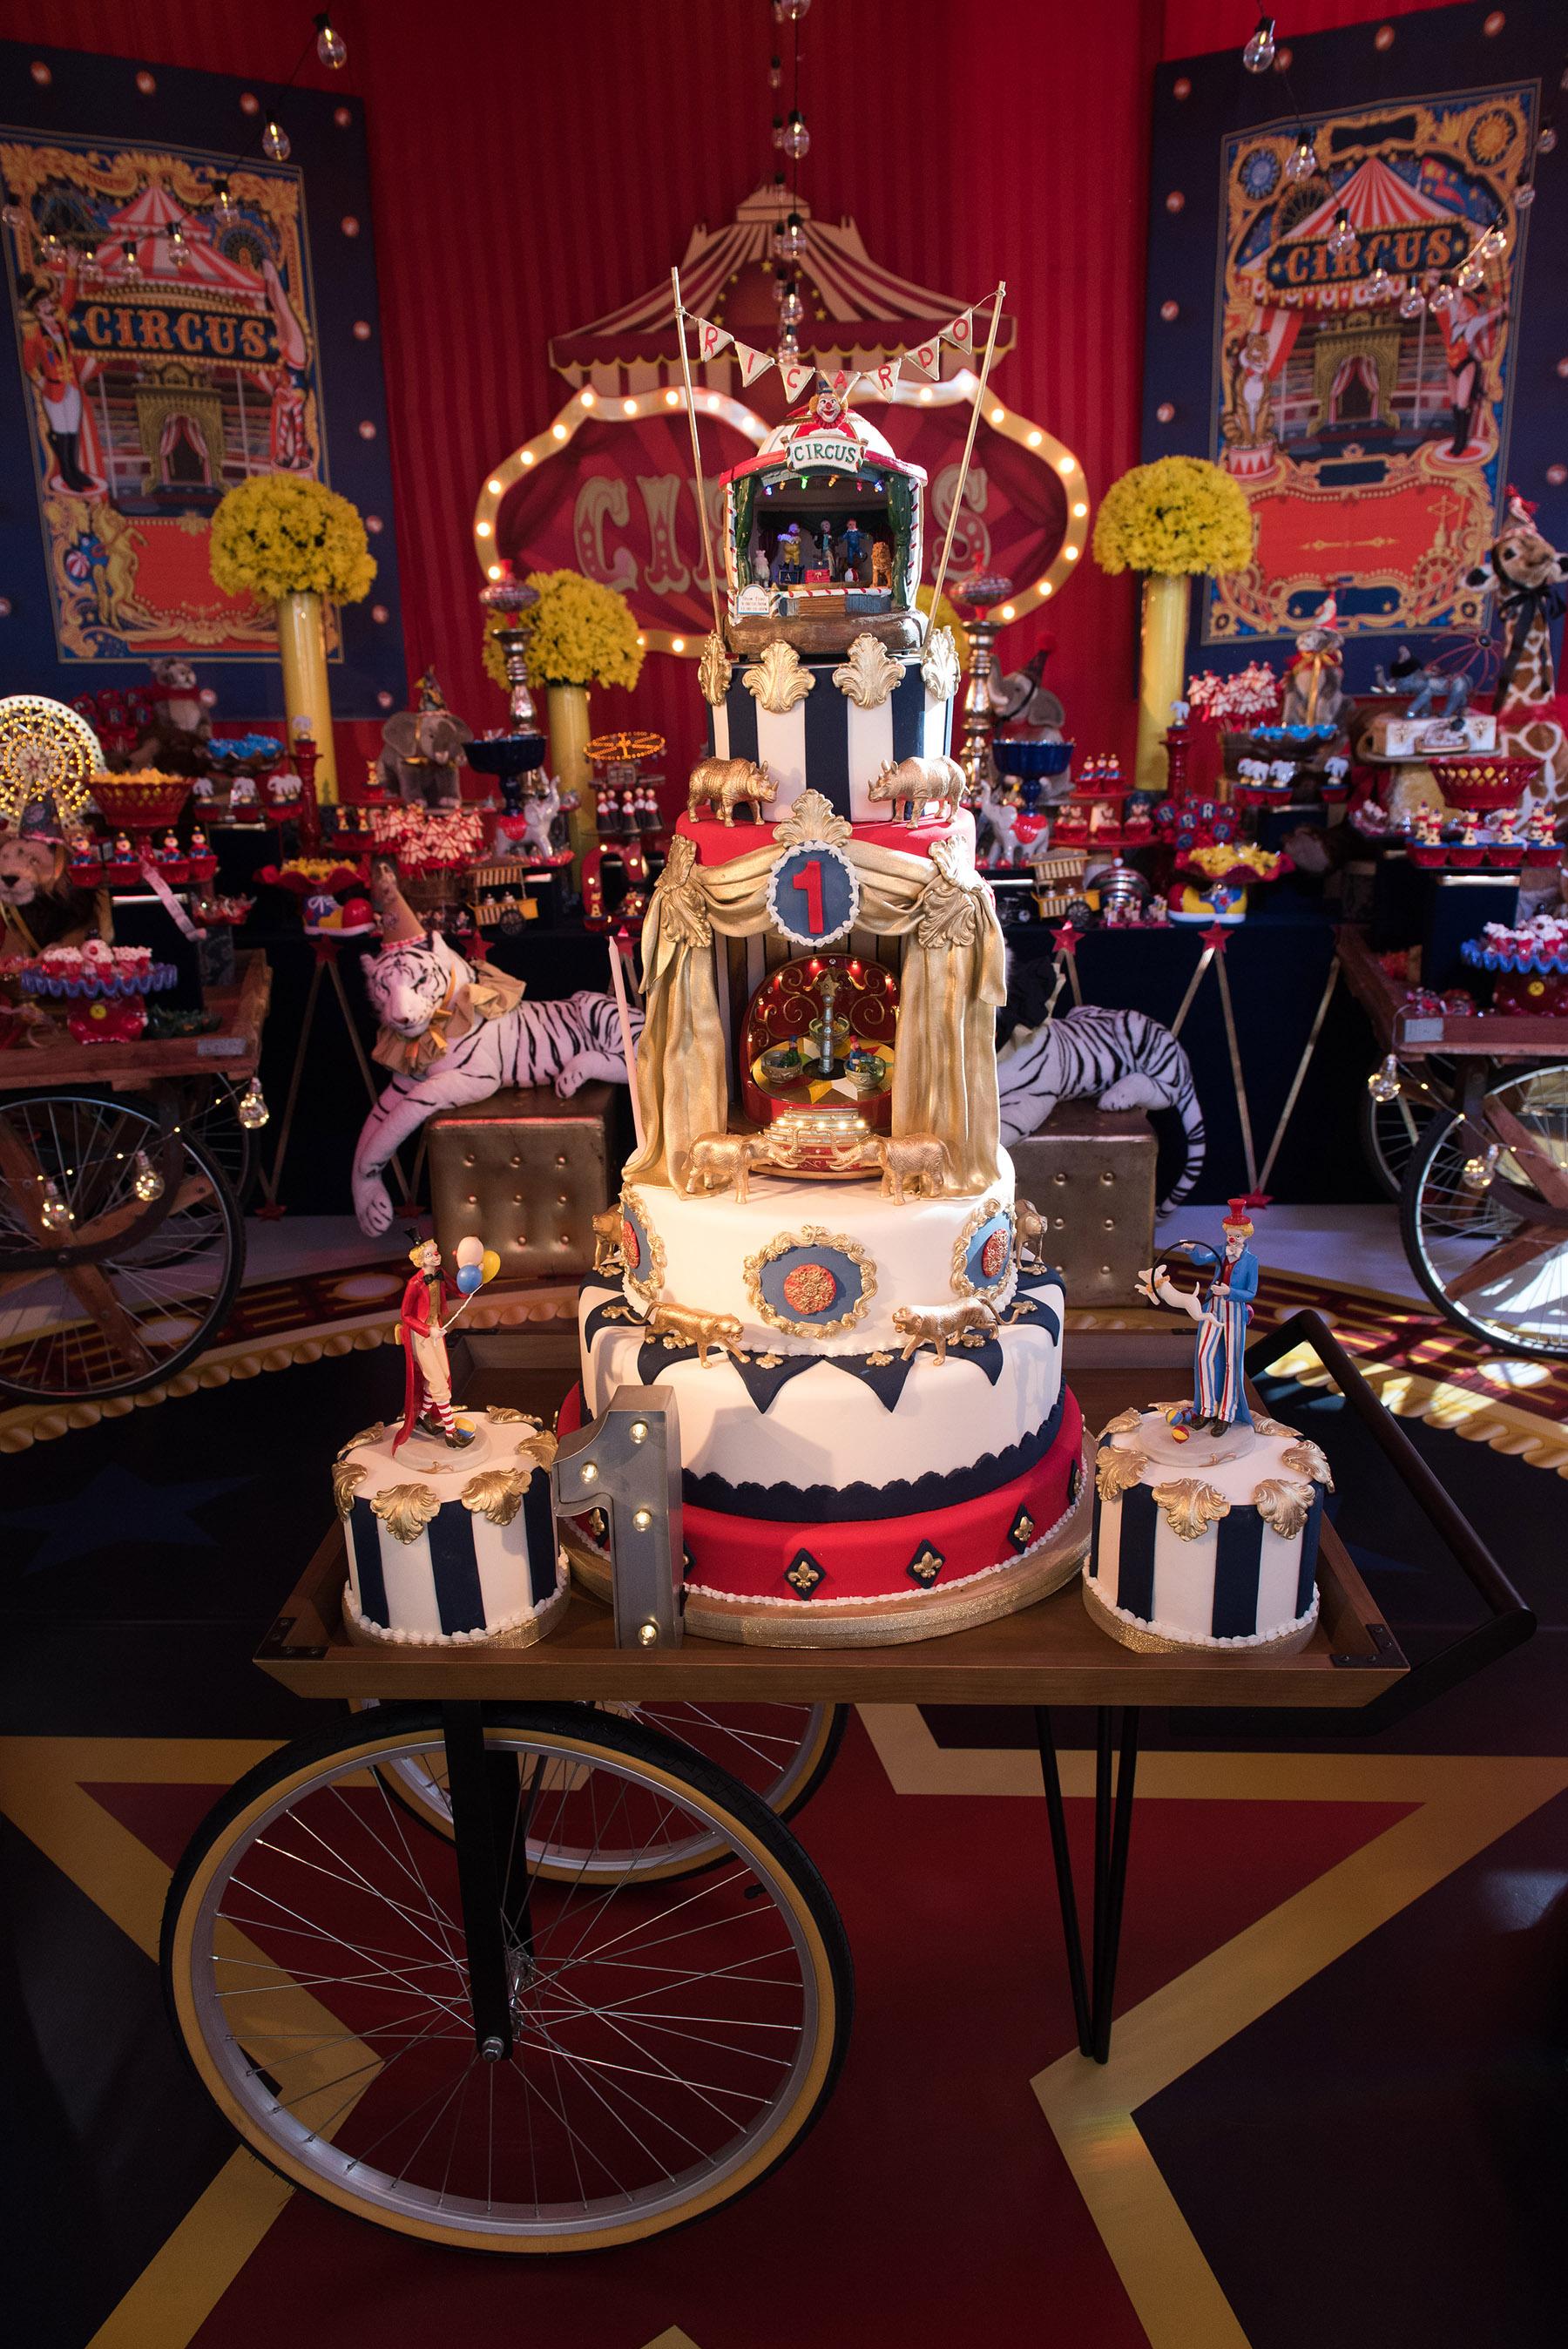 33_festa_infantil_curitiba_tema_circo.jpg